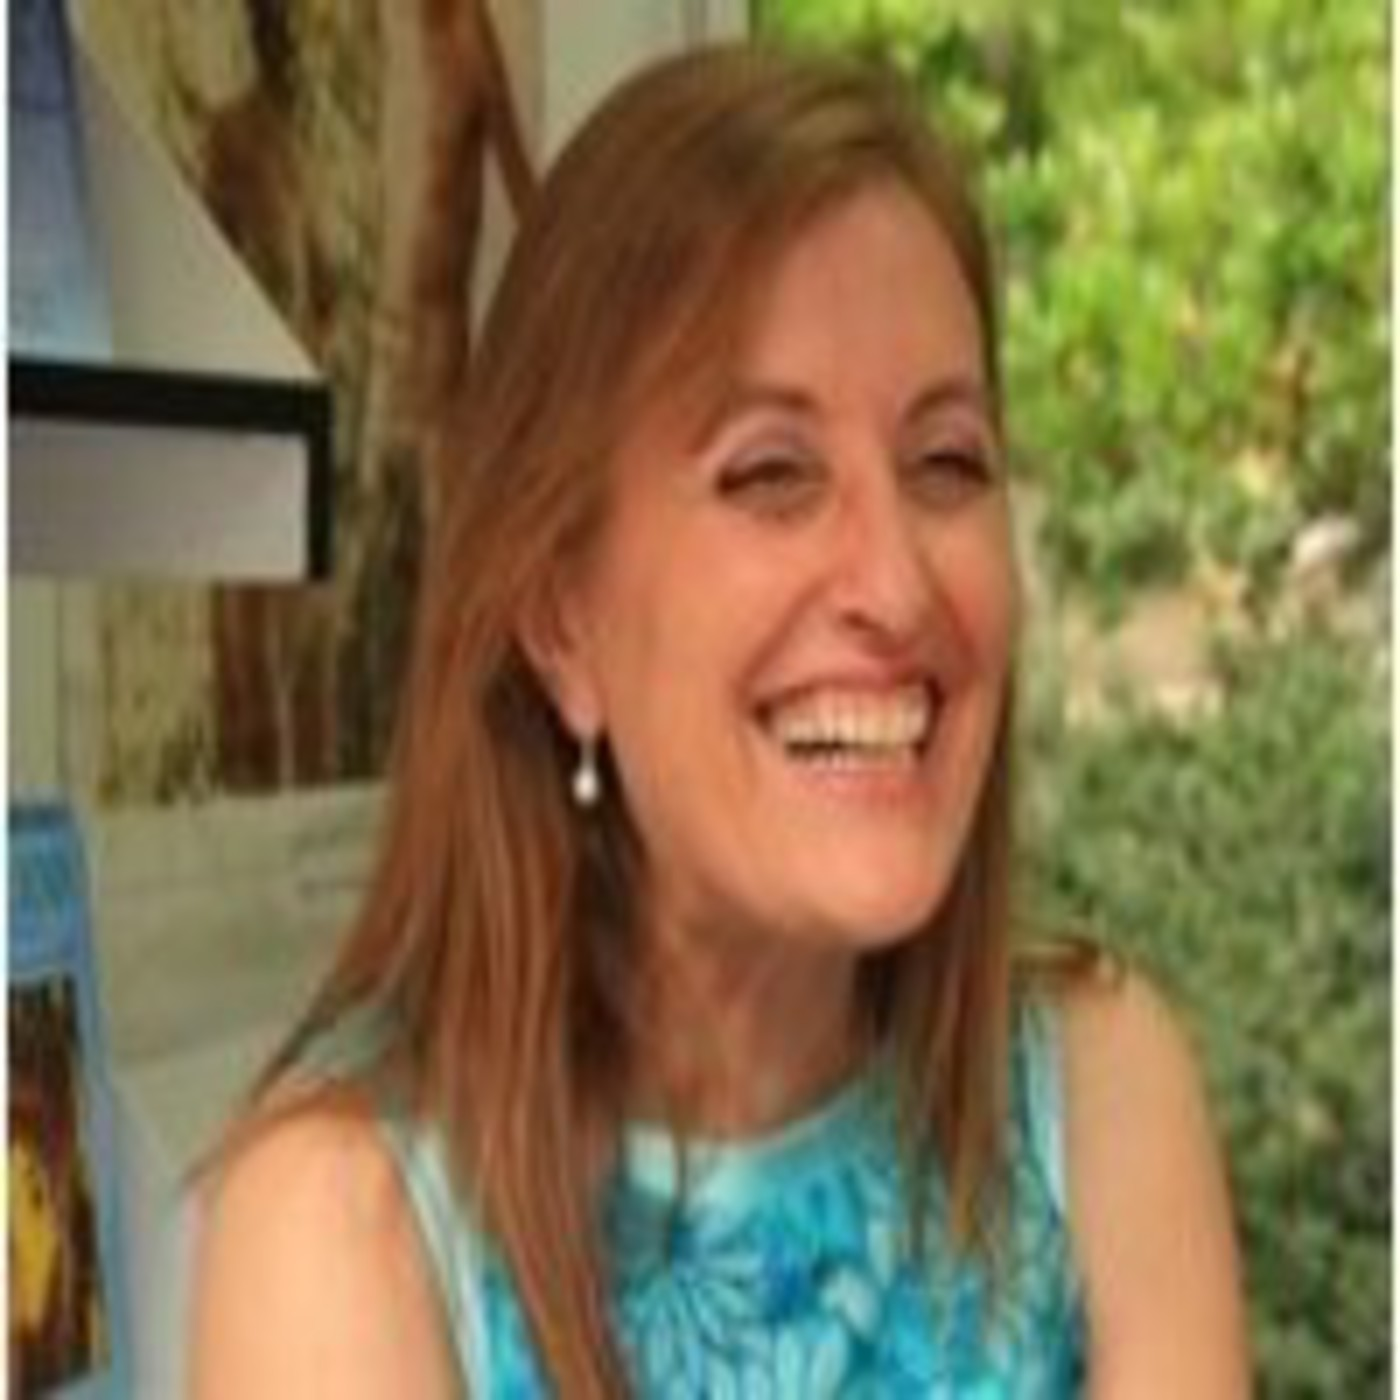 Emisión 162 - Entrevista a la poetisa María Rosa González Méndez